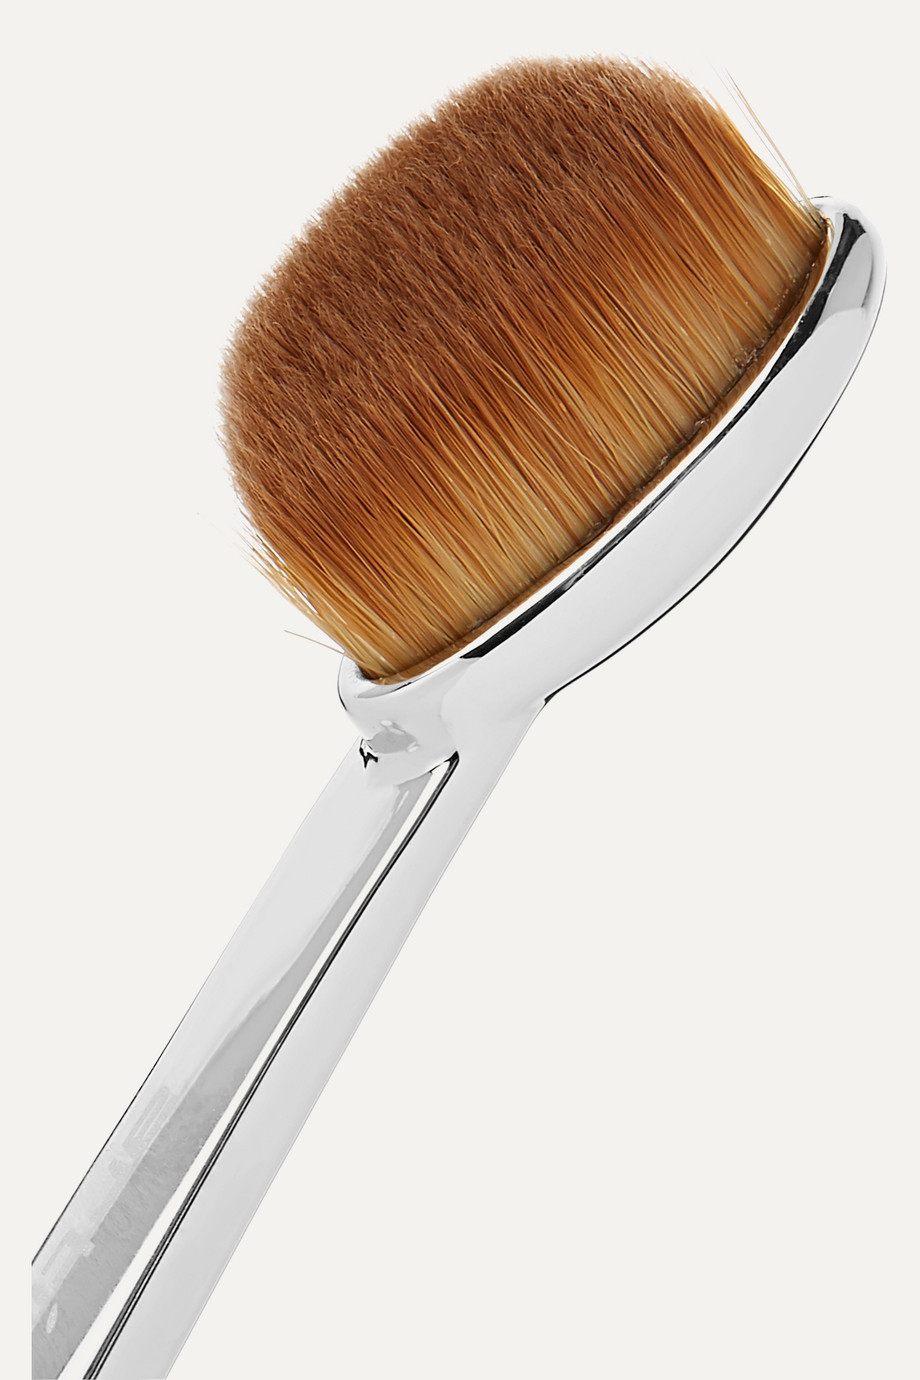 Artis Brush Next Generation Elite Mirror Oval 3 Brush